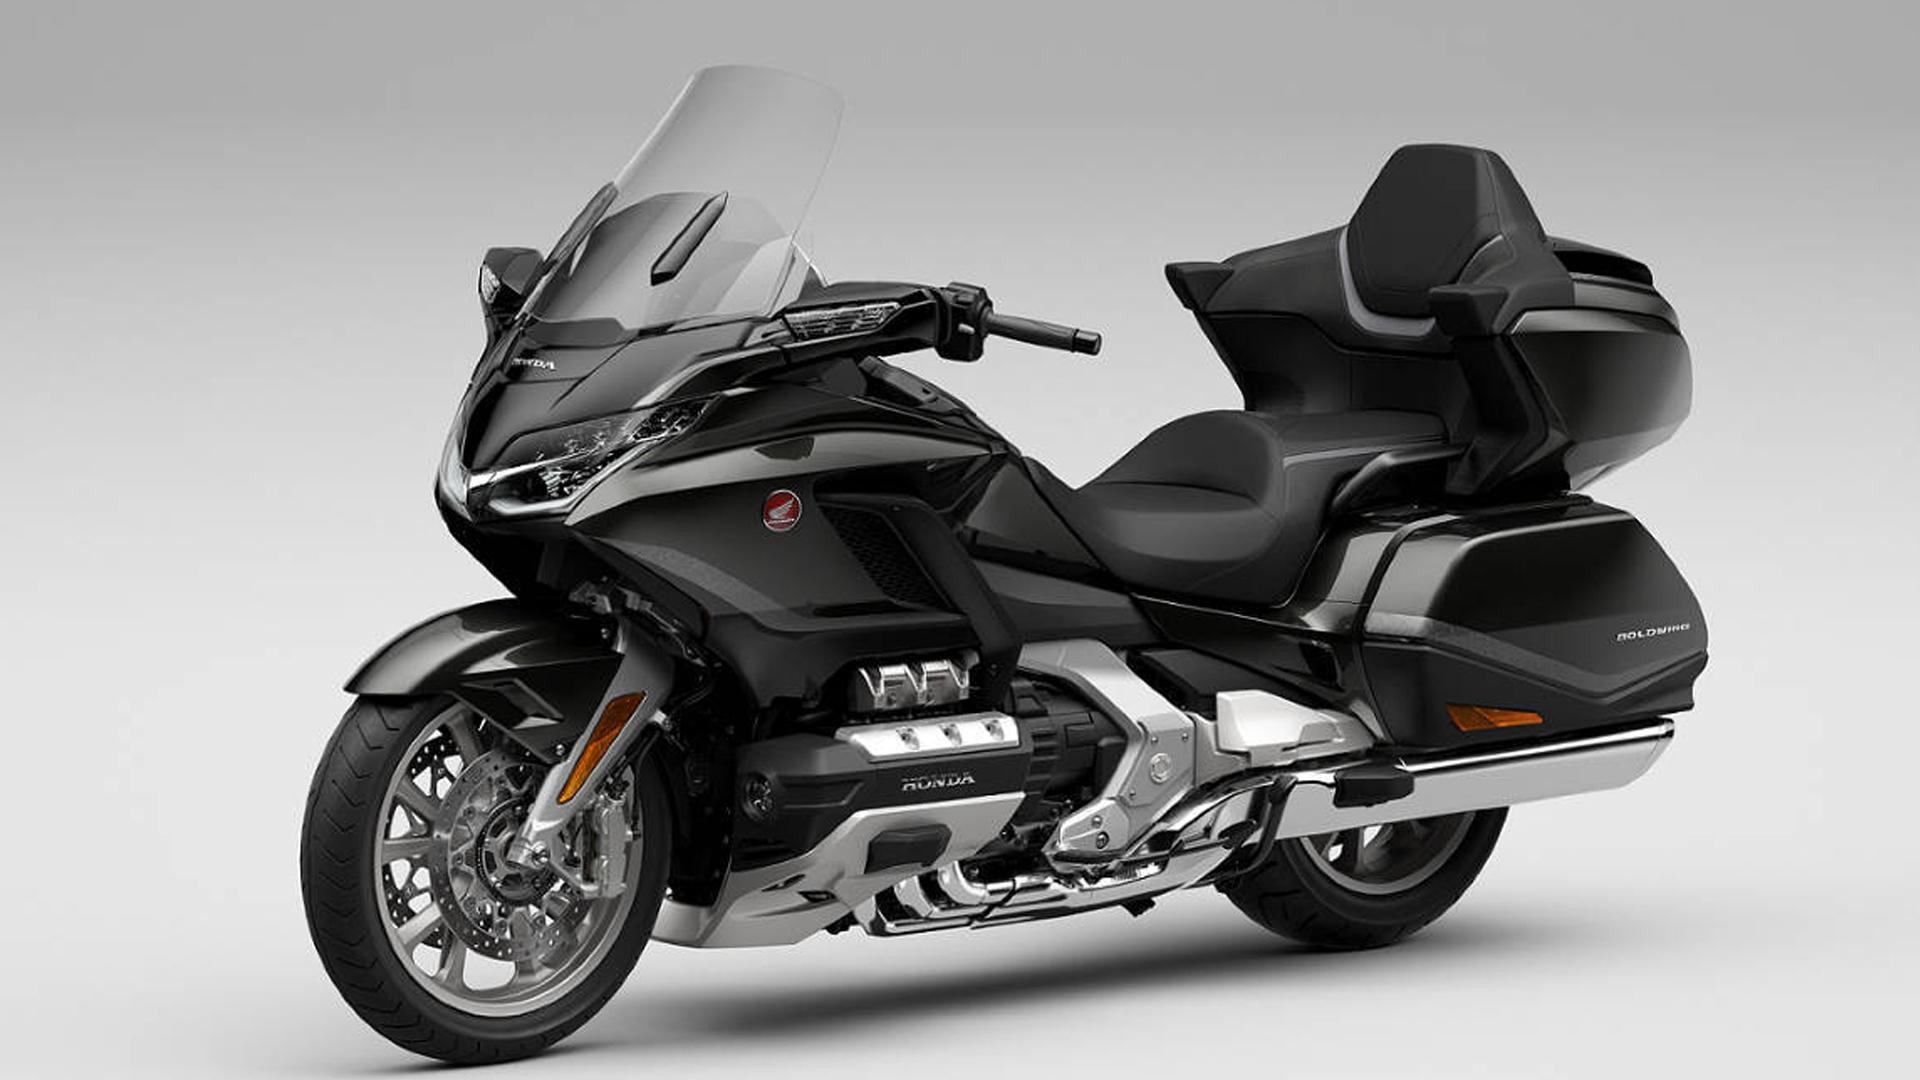 Honda Goldwing 2021 DCT Plus Airbag